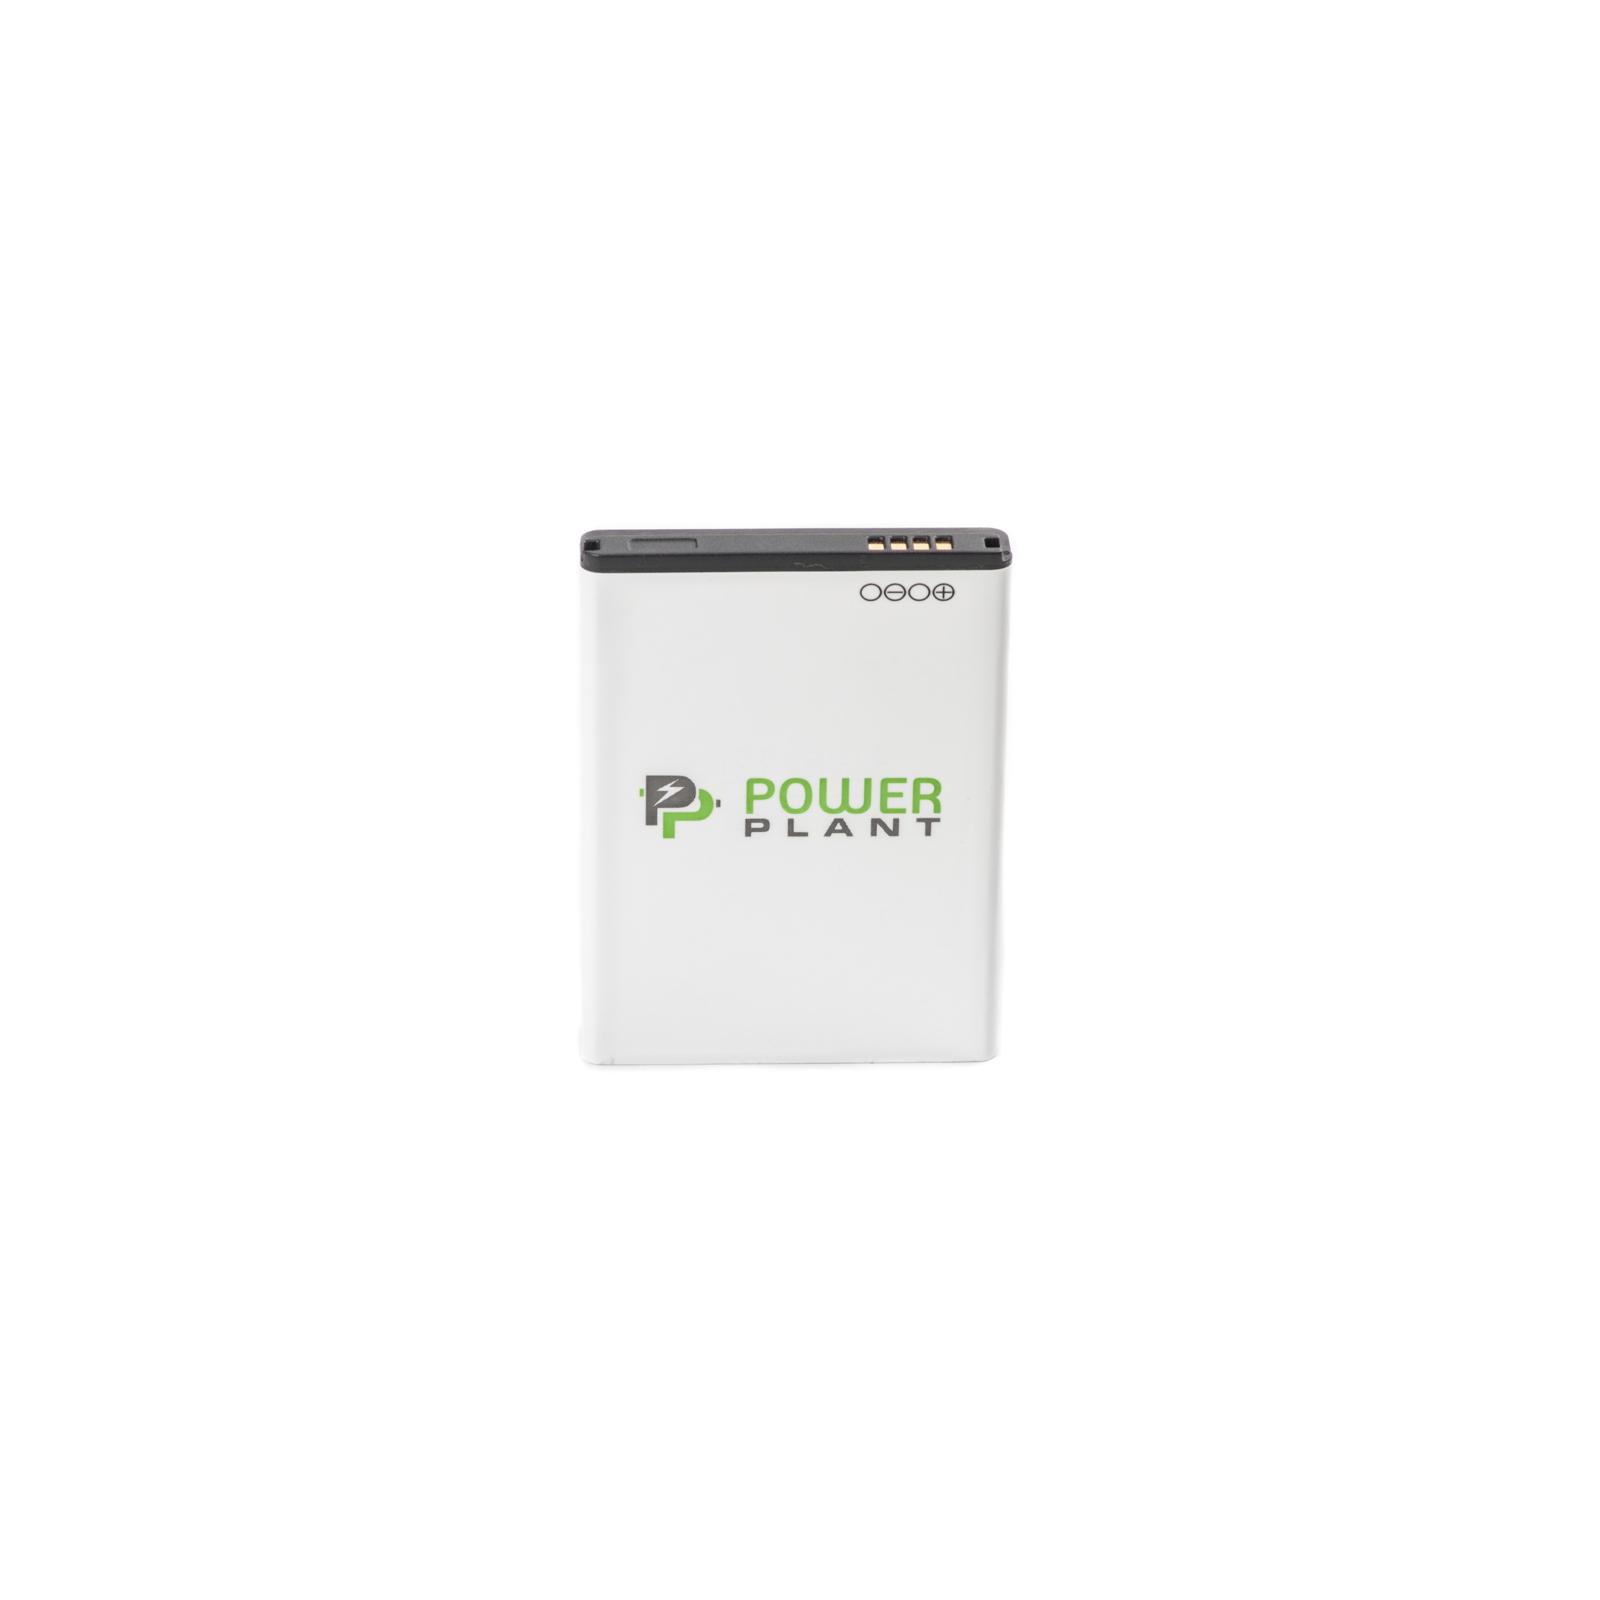 Аккумуляторная батарея PowerPlant Samsung i9250 (Galaxy Nexus) усиленный (DV00DV6075) изображение 2